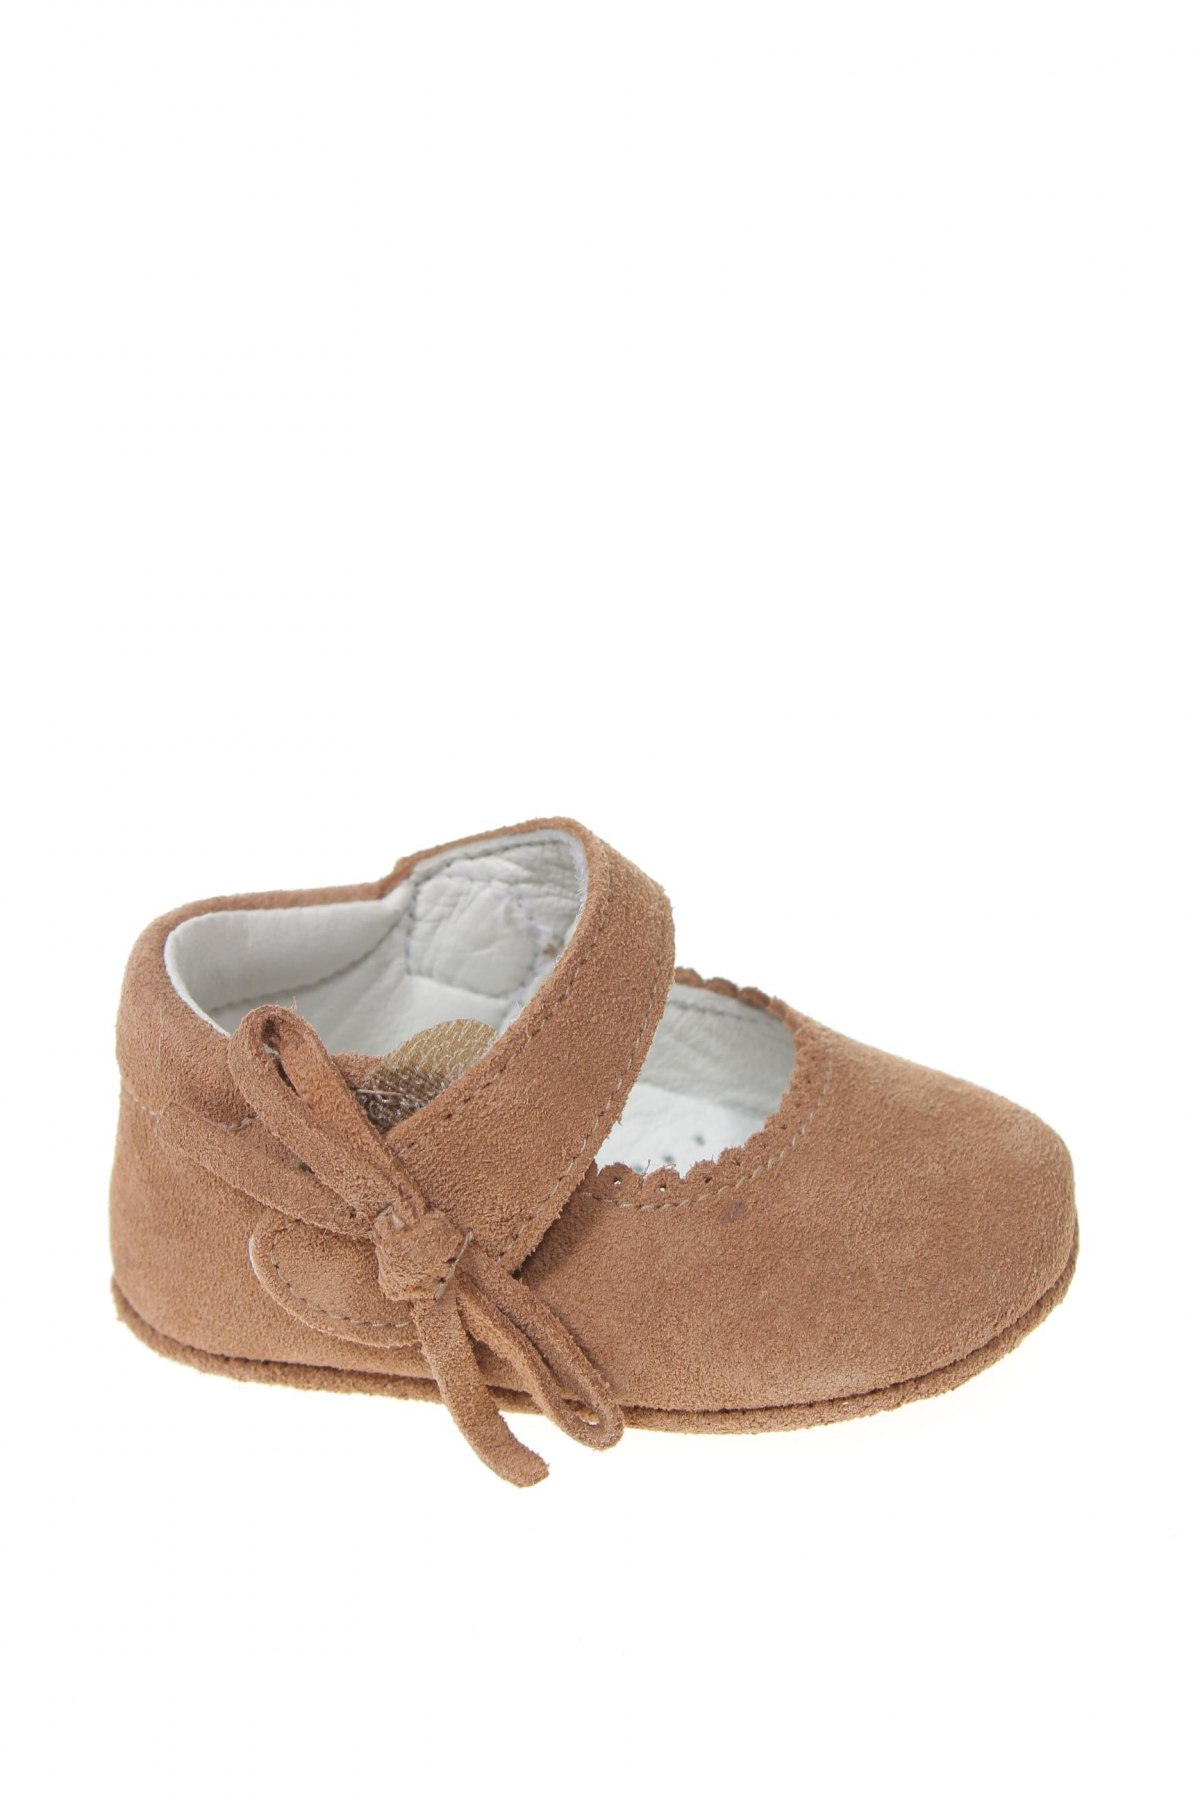 Детски обувки Lola Palacios, Размер 15, Цвят Кафяв, Естествен велур, Цена 13,28лв.